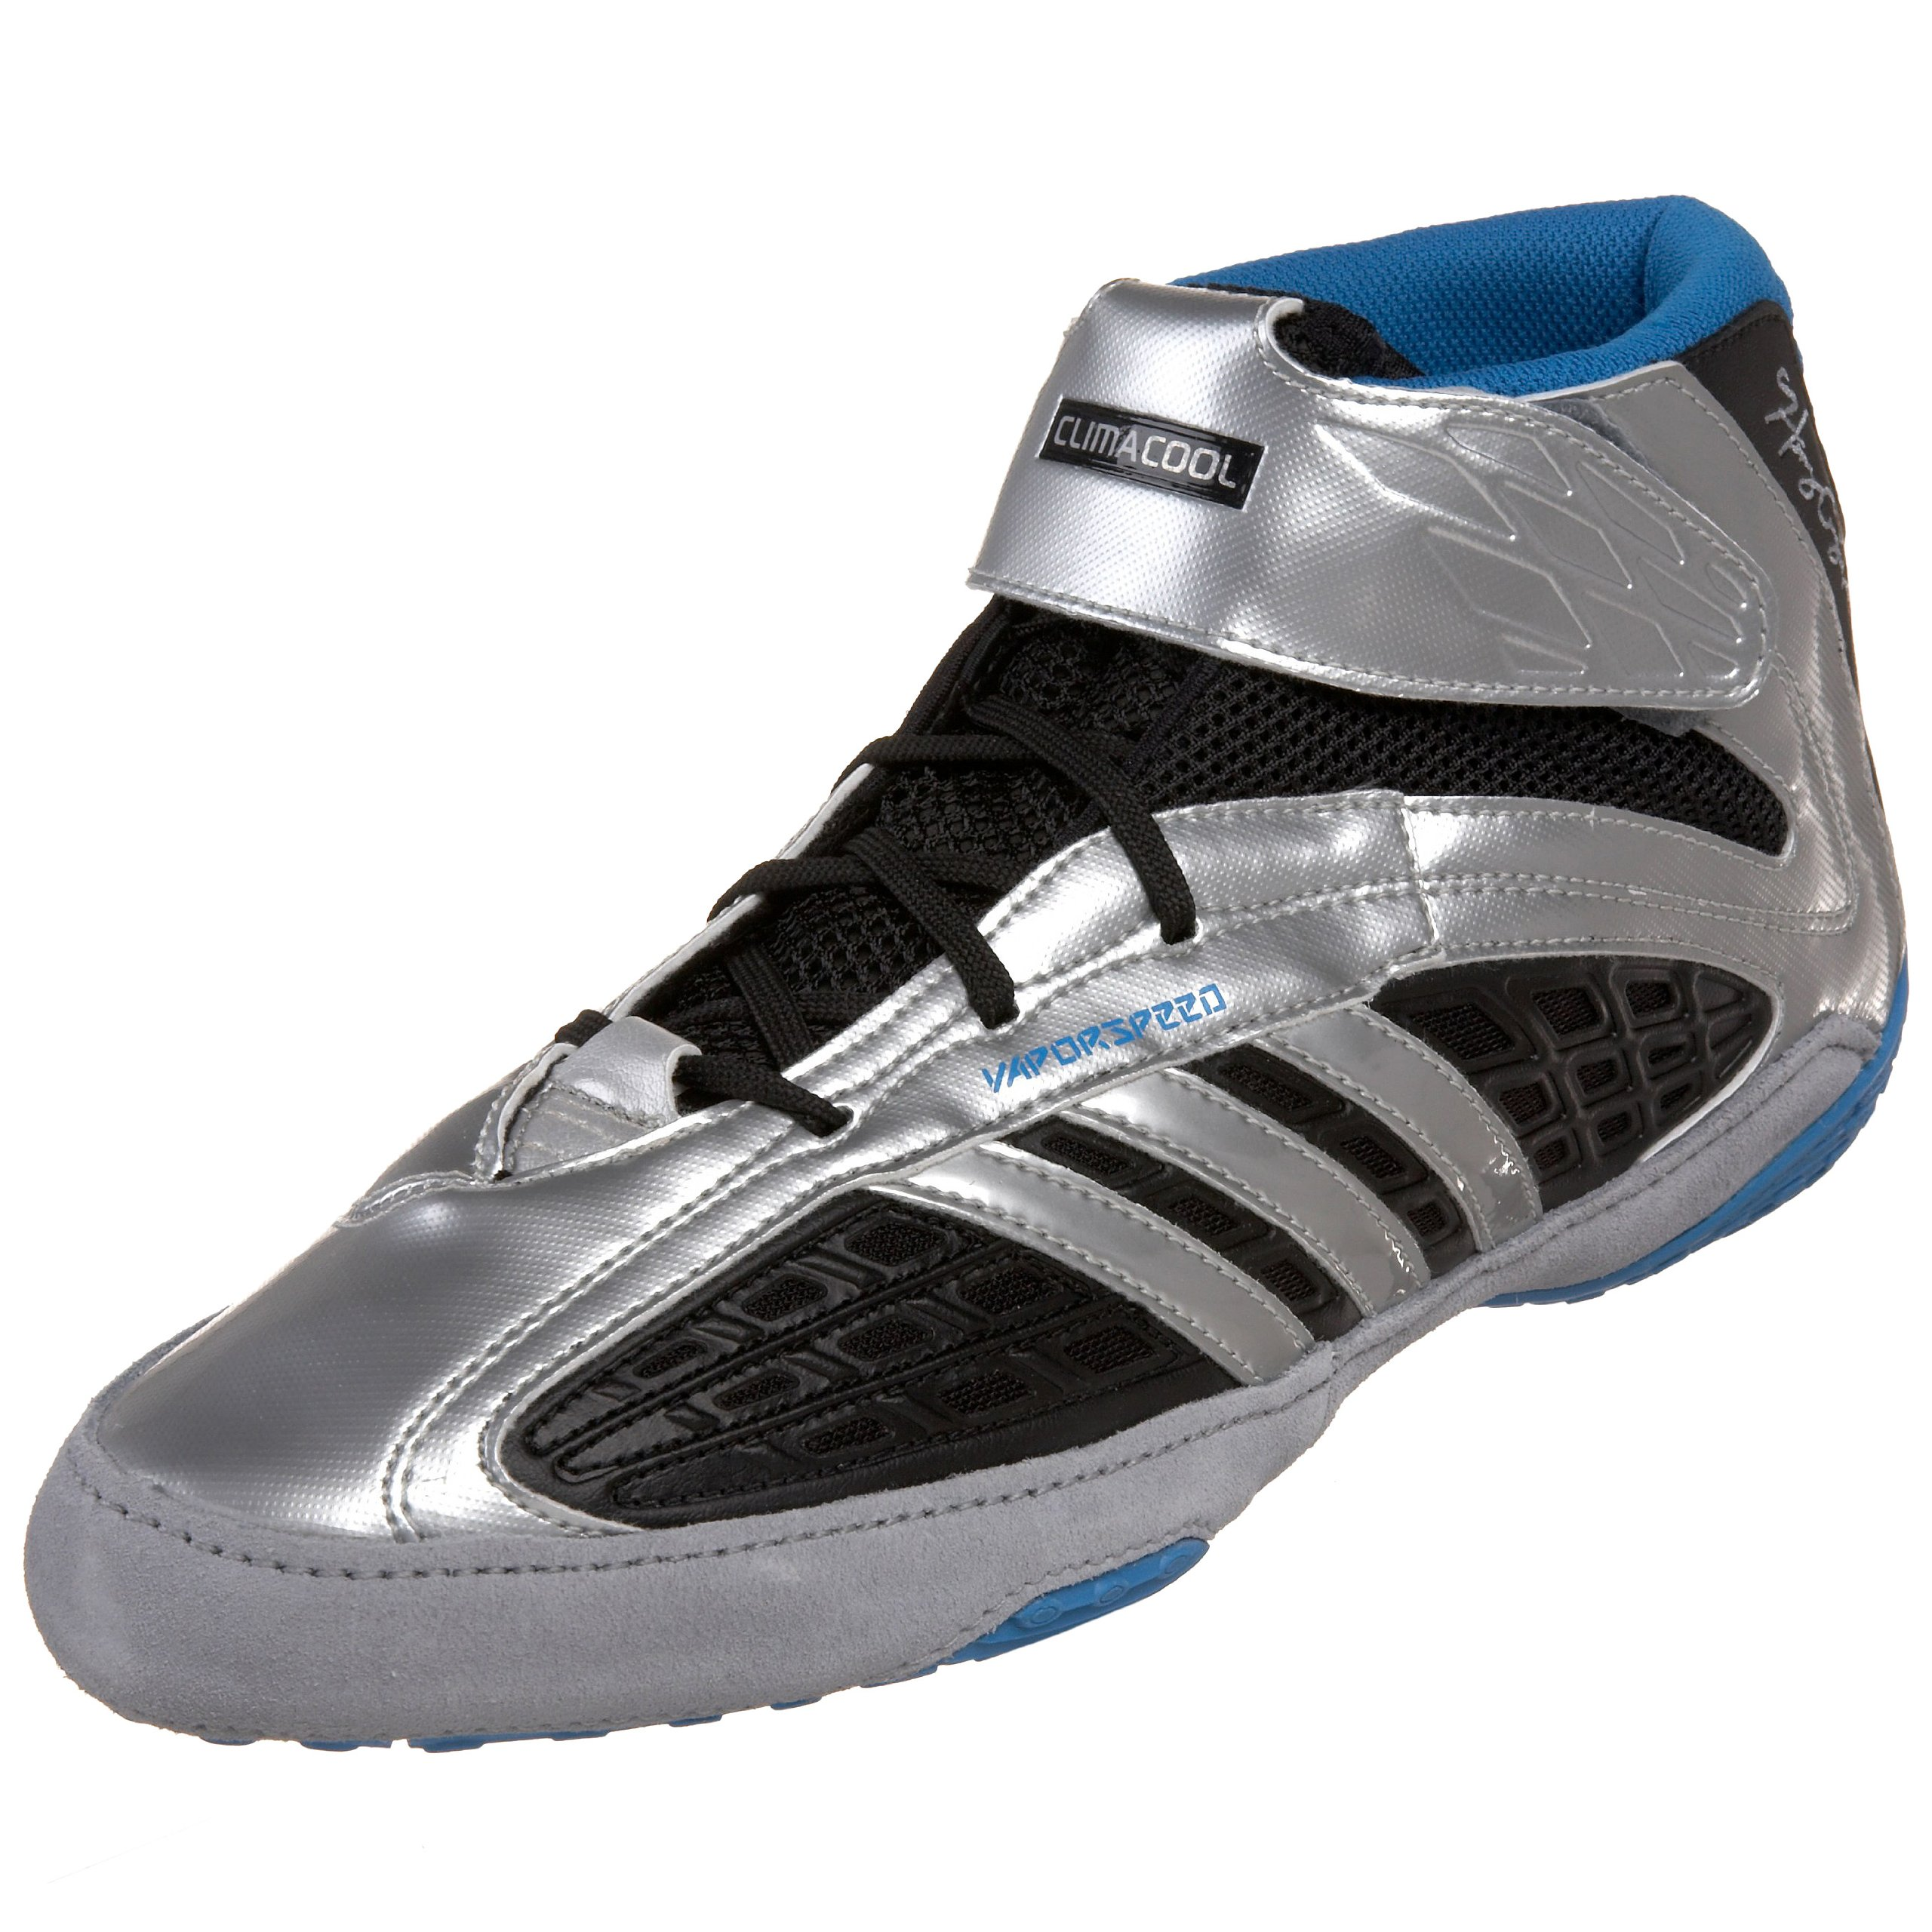 adidas Men's Vaporspeed II Henry Cejudo Wrestling Shoe,Black/Silver/Pool,12 M US by adidas